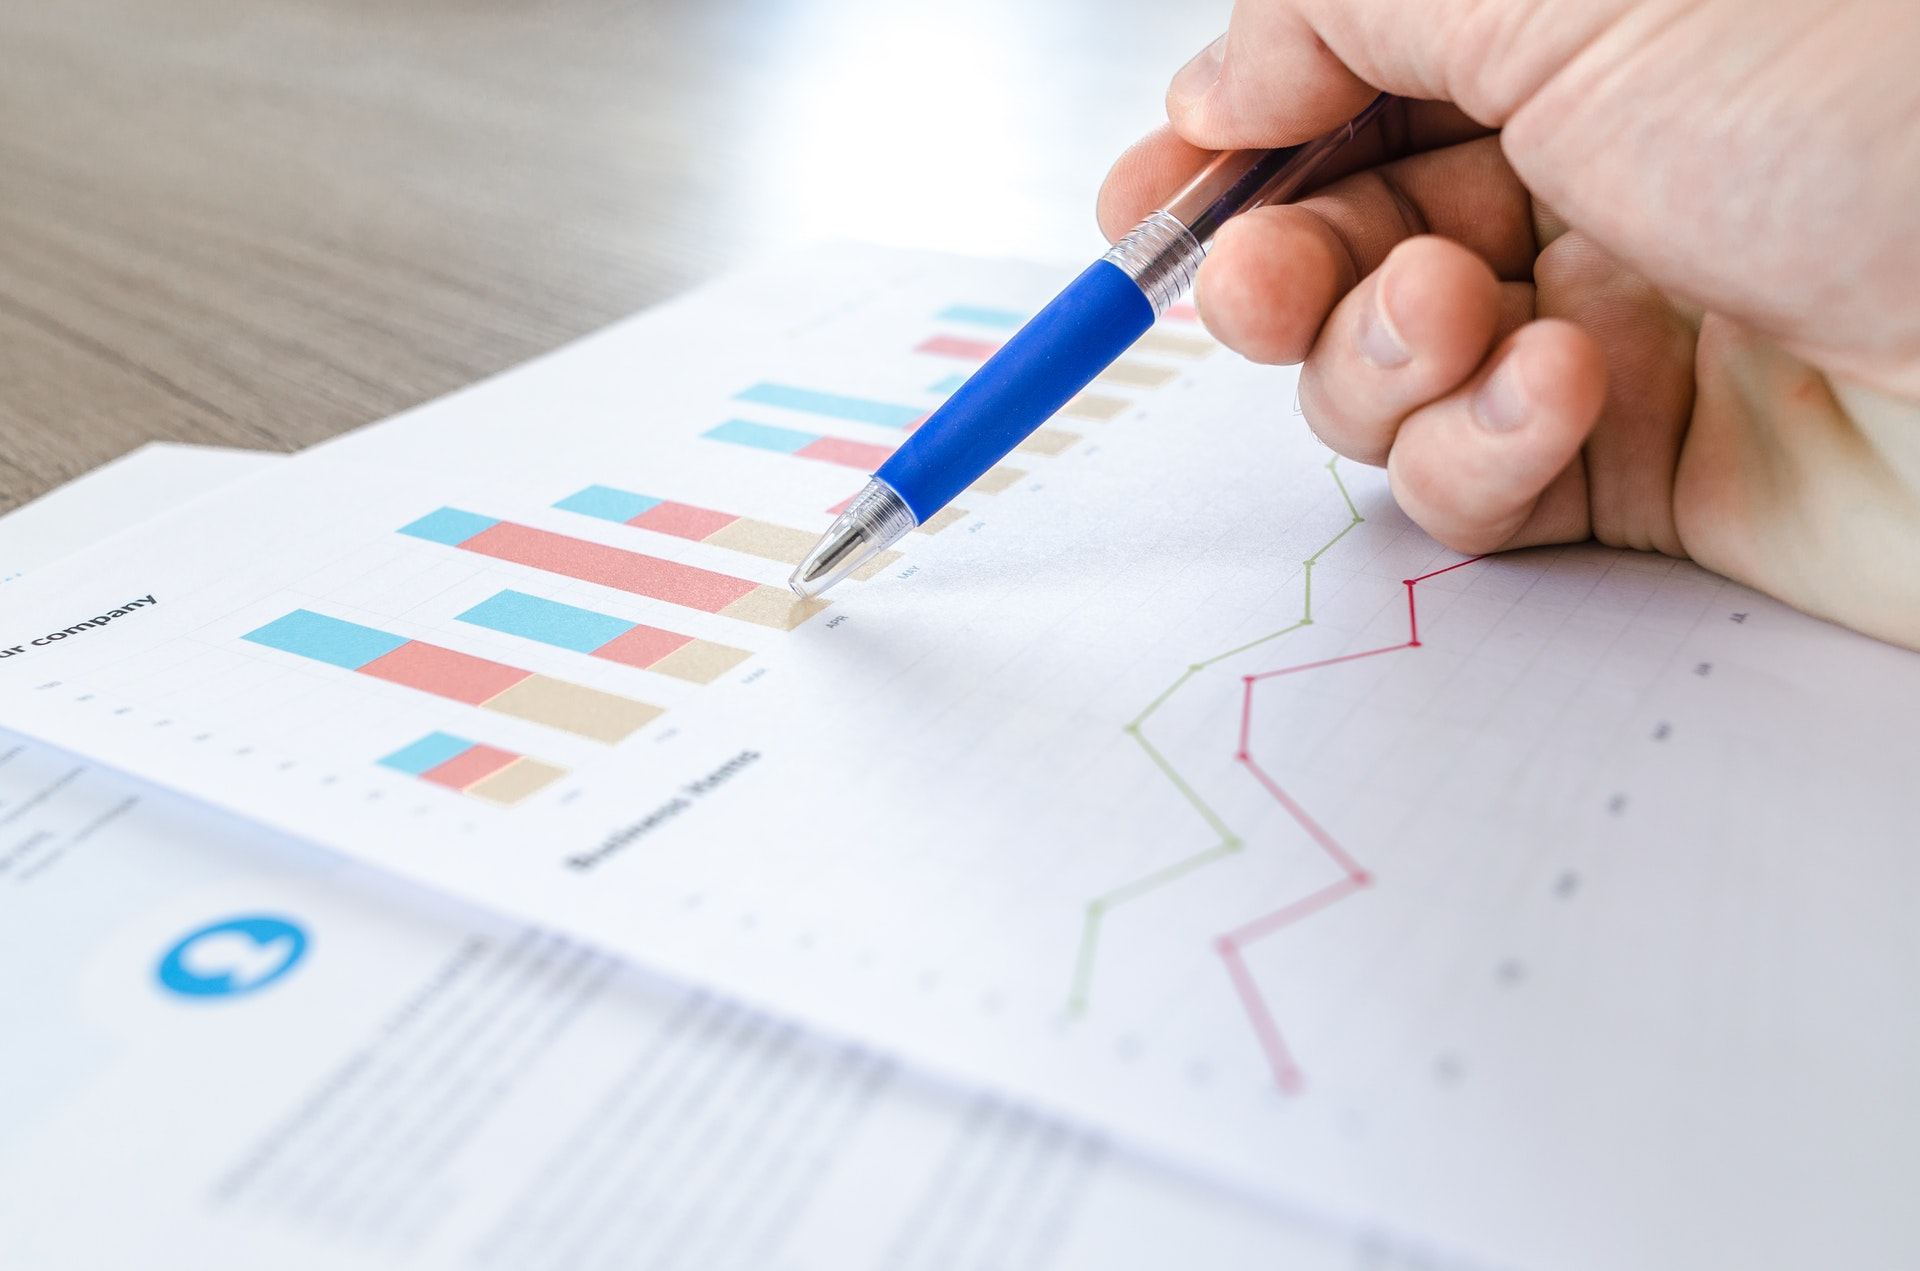 Key performance indicators should be quantitative